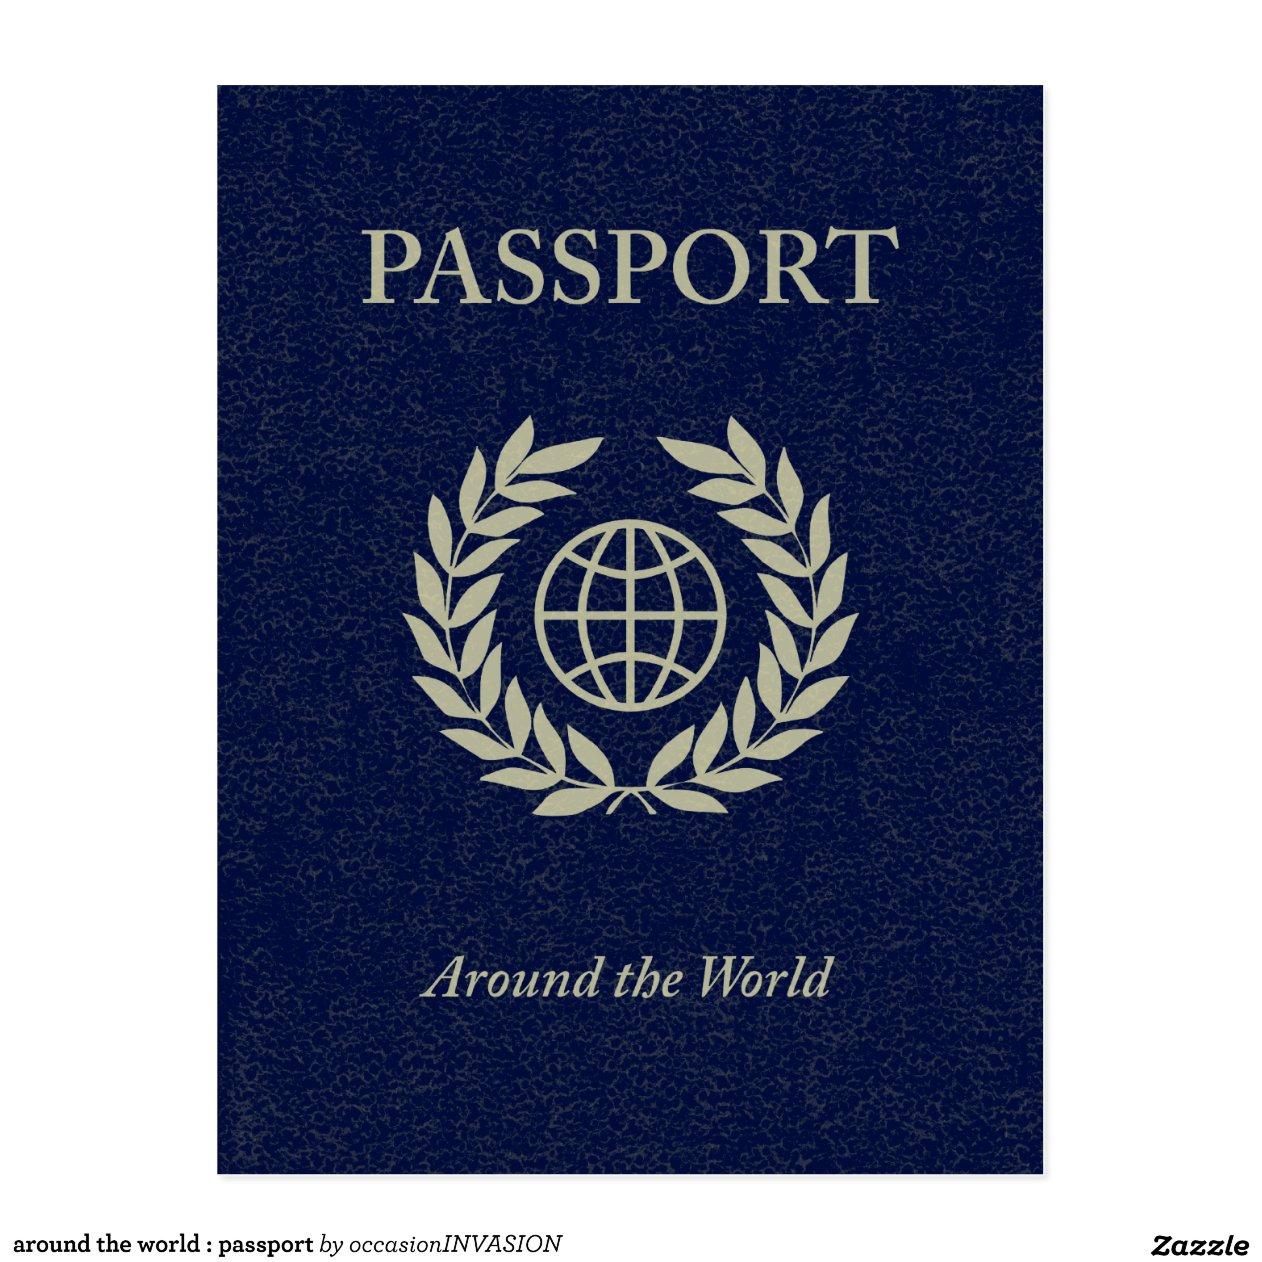 autour du monde passeport carte postale r8a3cadbc2819450490d60299582ba846 vgbaq 8byvr. Black Bedroom Furniture Sets. Home Design Ideas